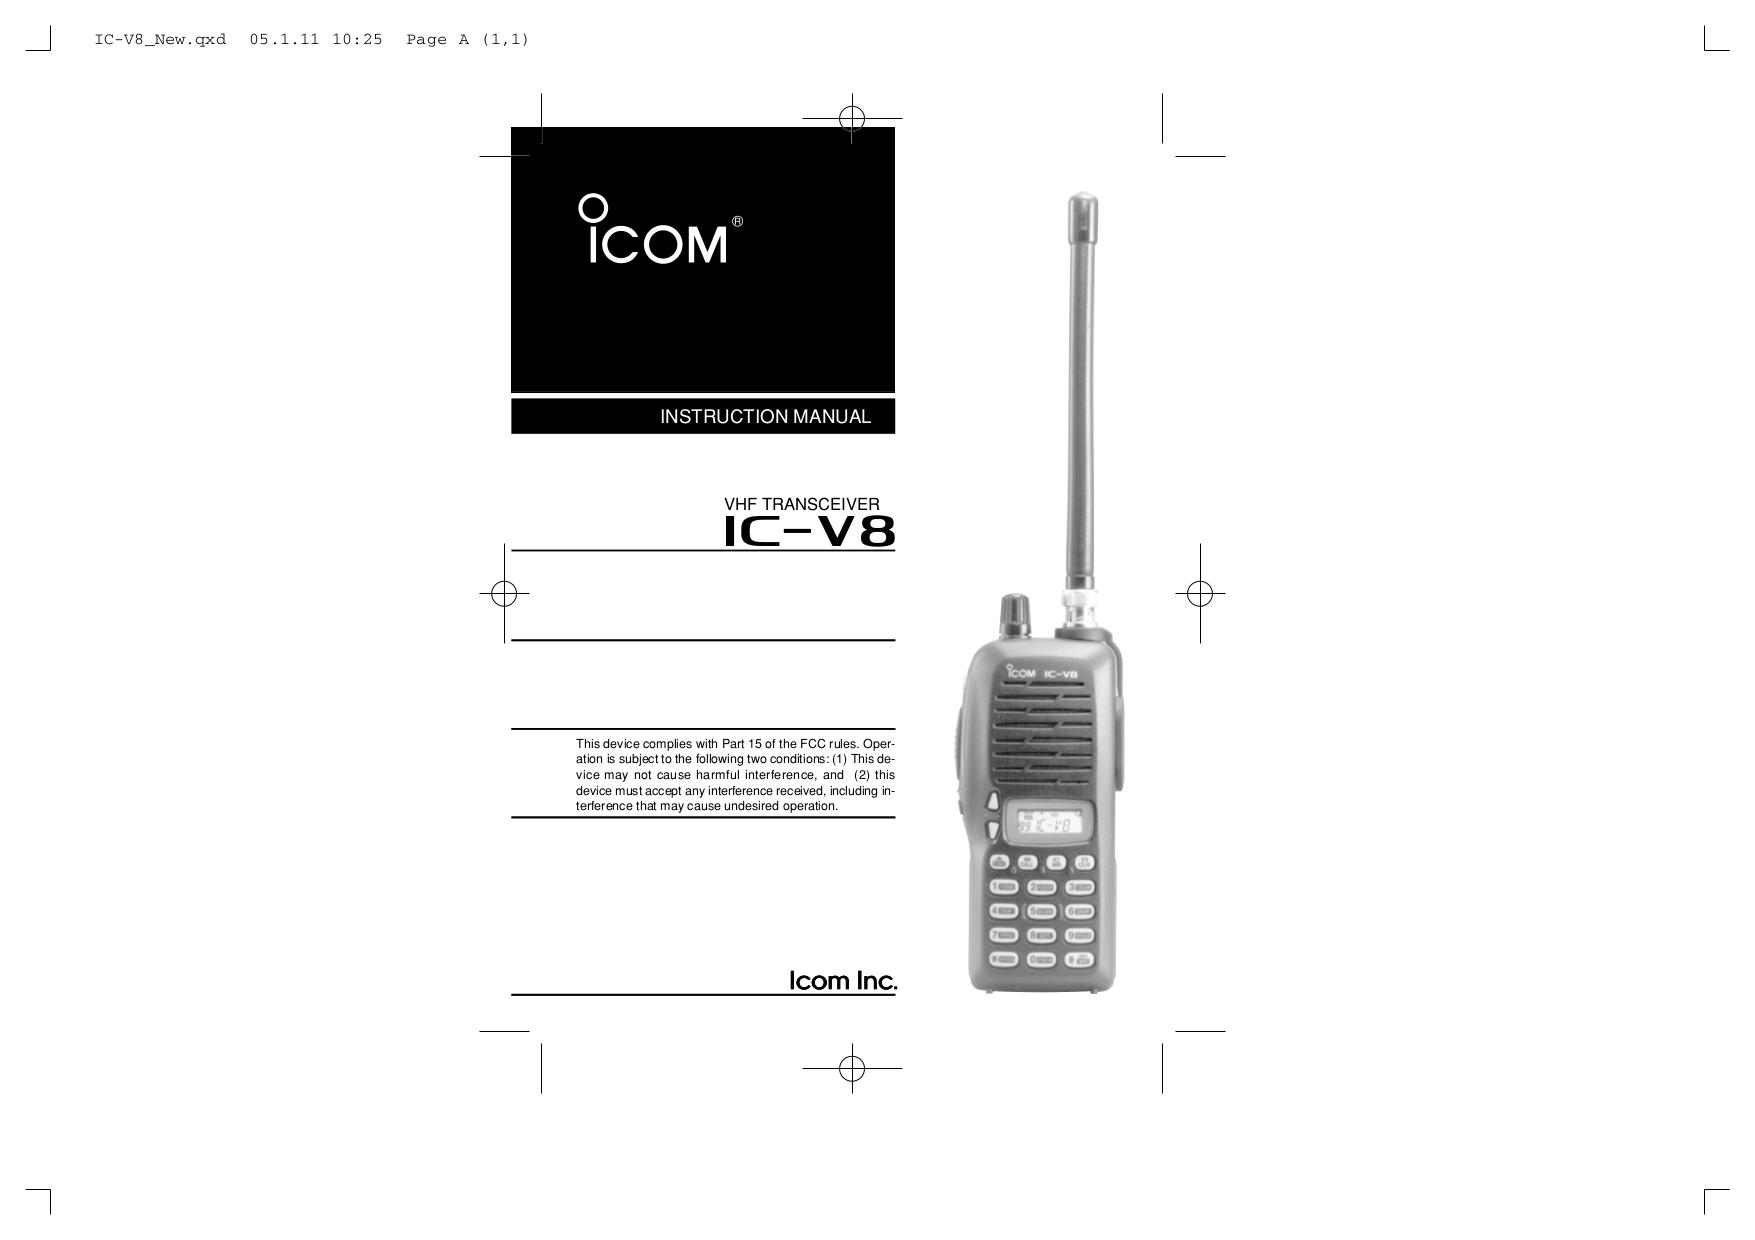 download free pdf for icom ic v8 2 way radio manual rh umlib com Mods Icom IC V8 Icom IC V8 Battery Charger